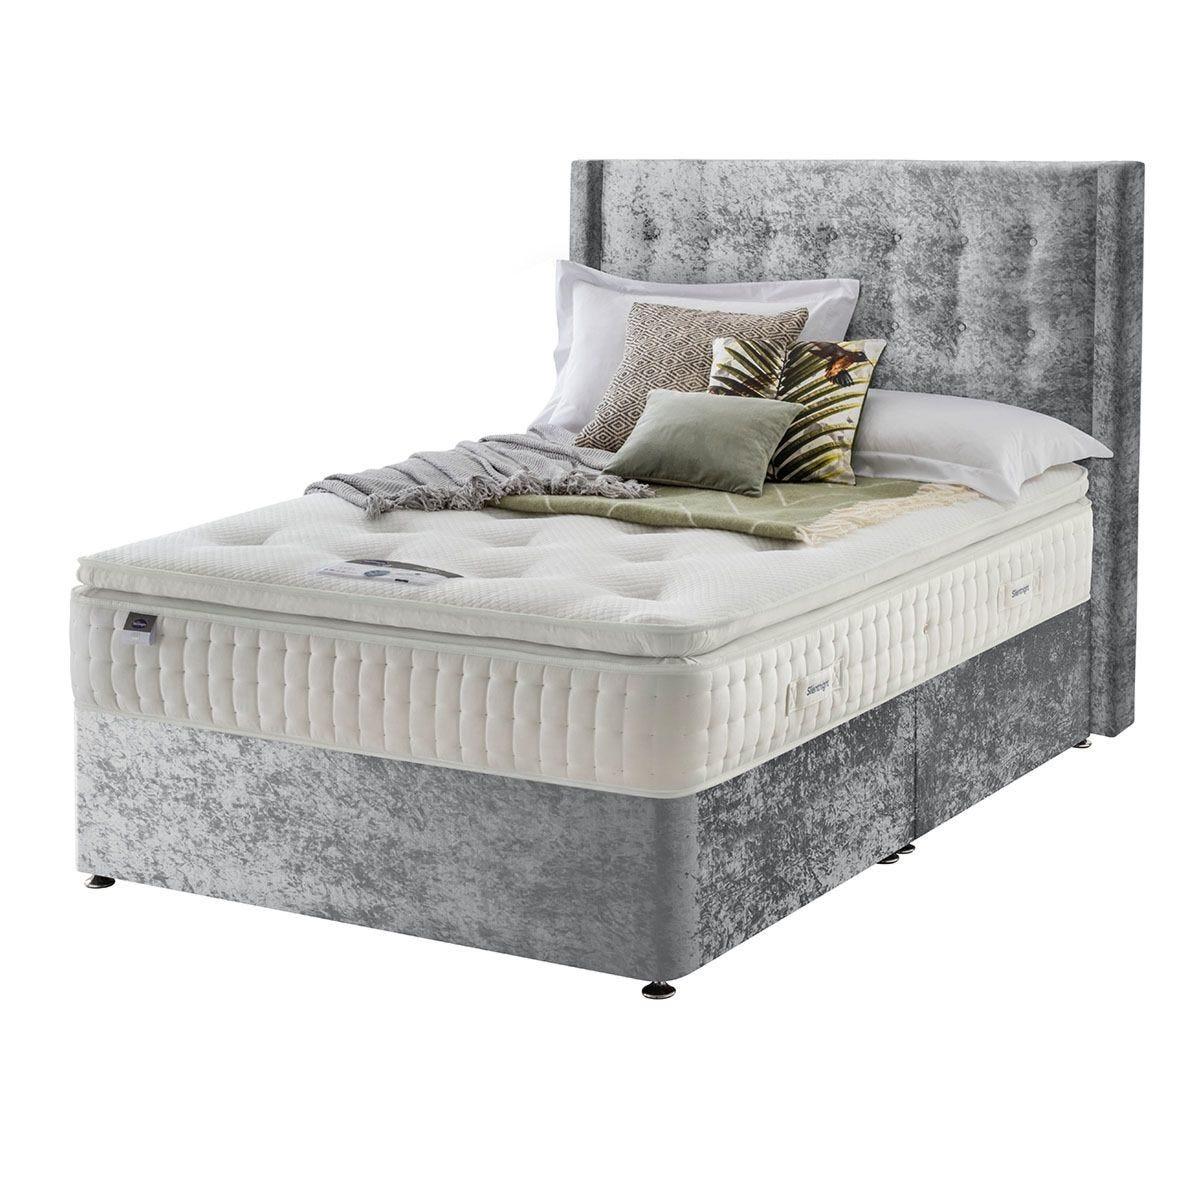 Silentnight Mirapocket Latex 1400 Non Storage Divan Bed - Crushed Velvet Light Grey Double